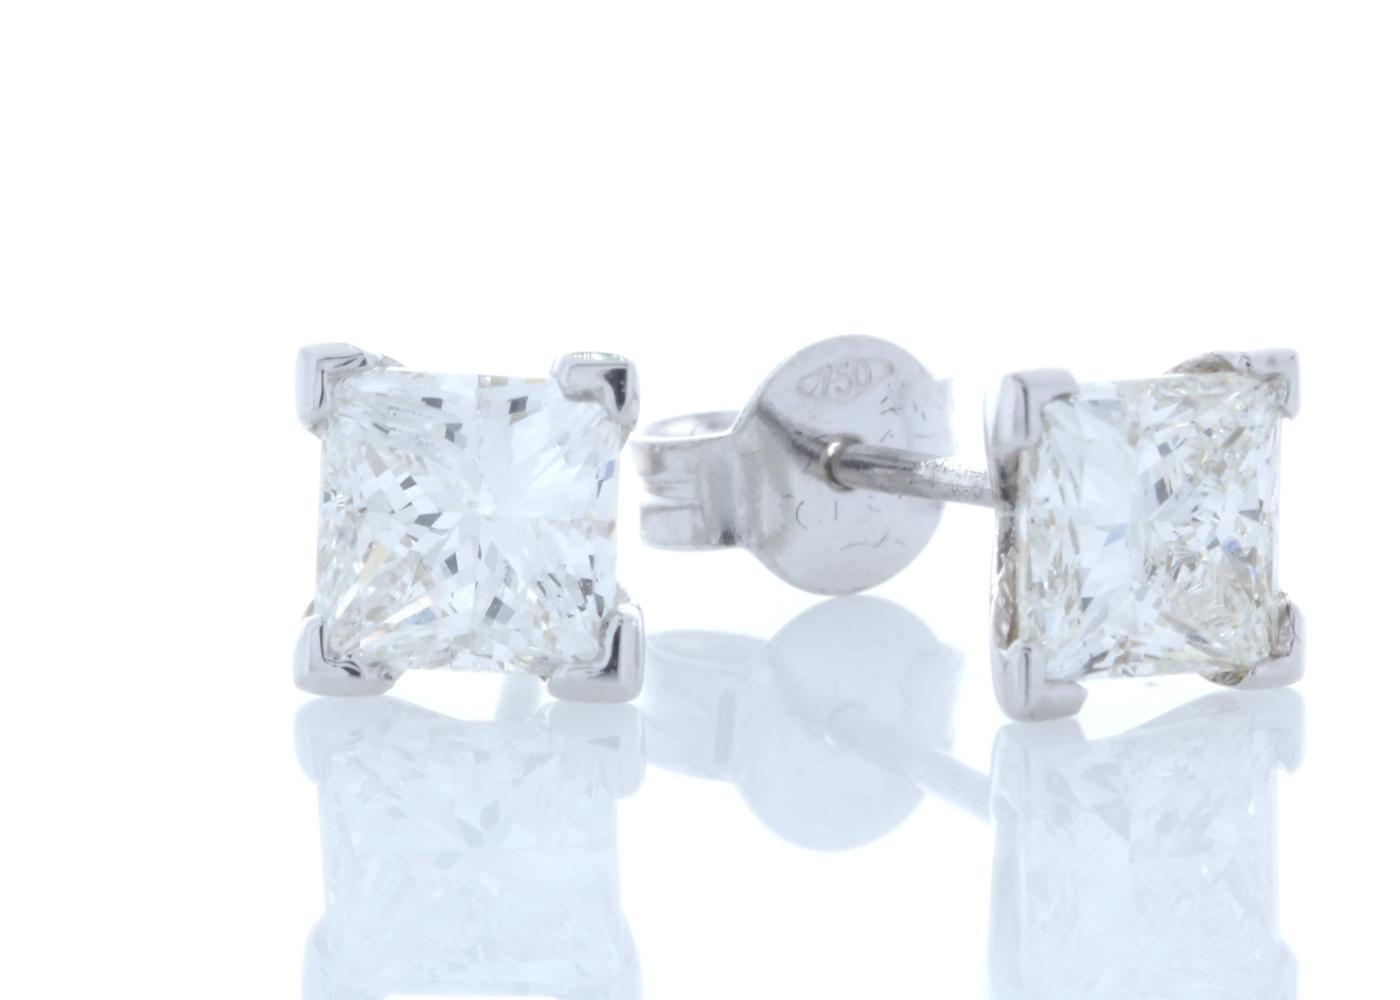 18ct White Gold Princess Cut Diamond Earrings 2.01 Carats - Image 2 of 3